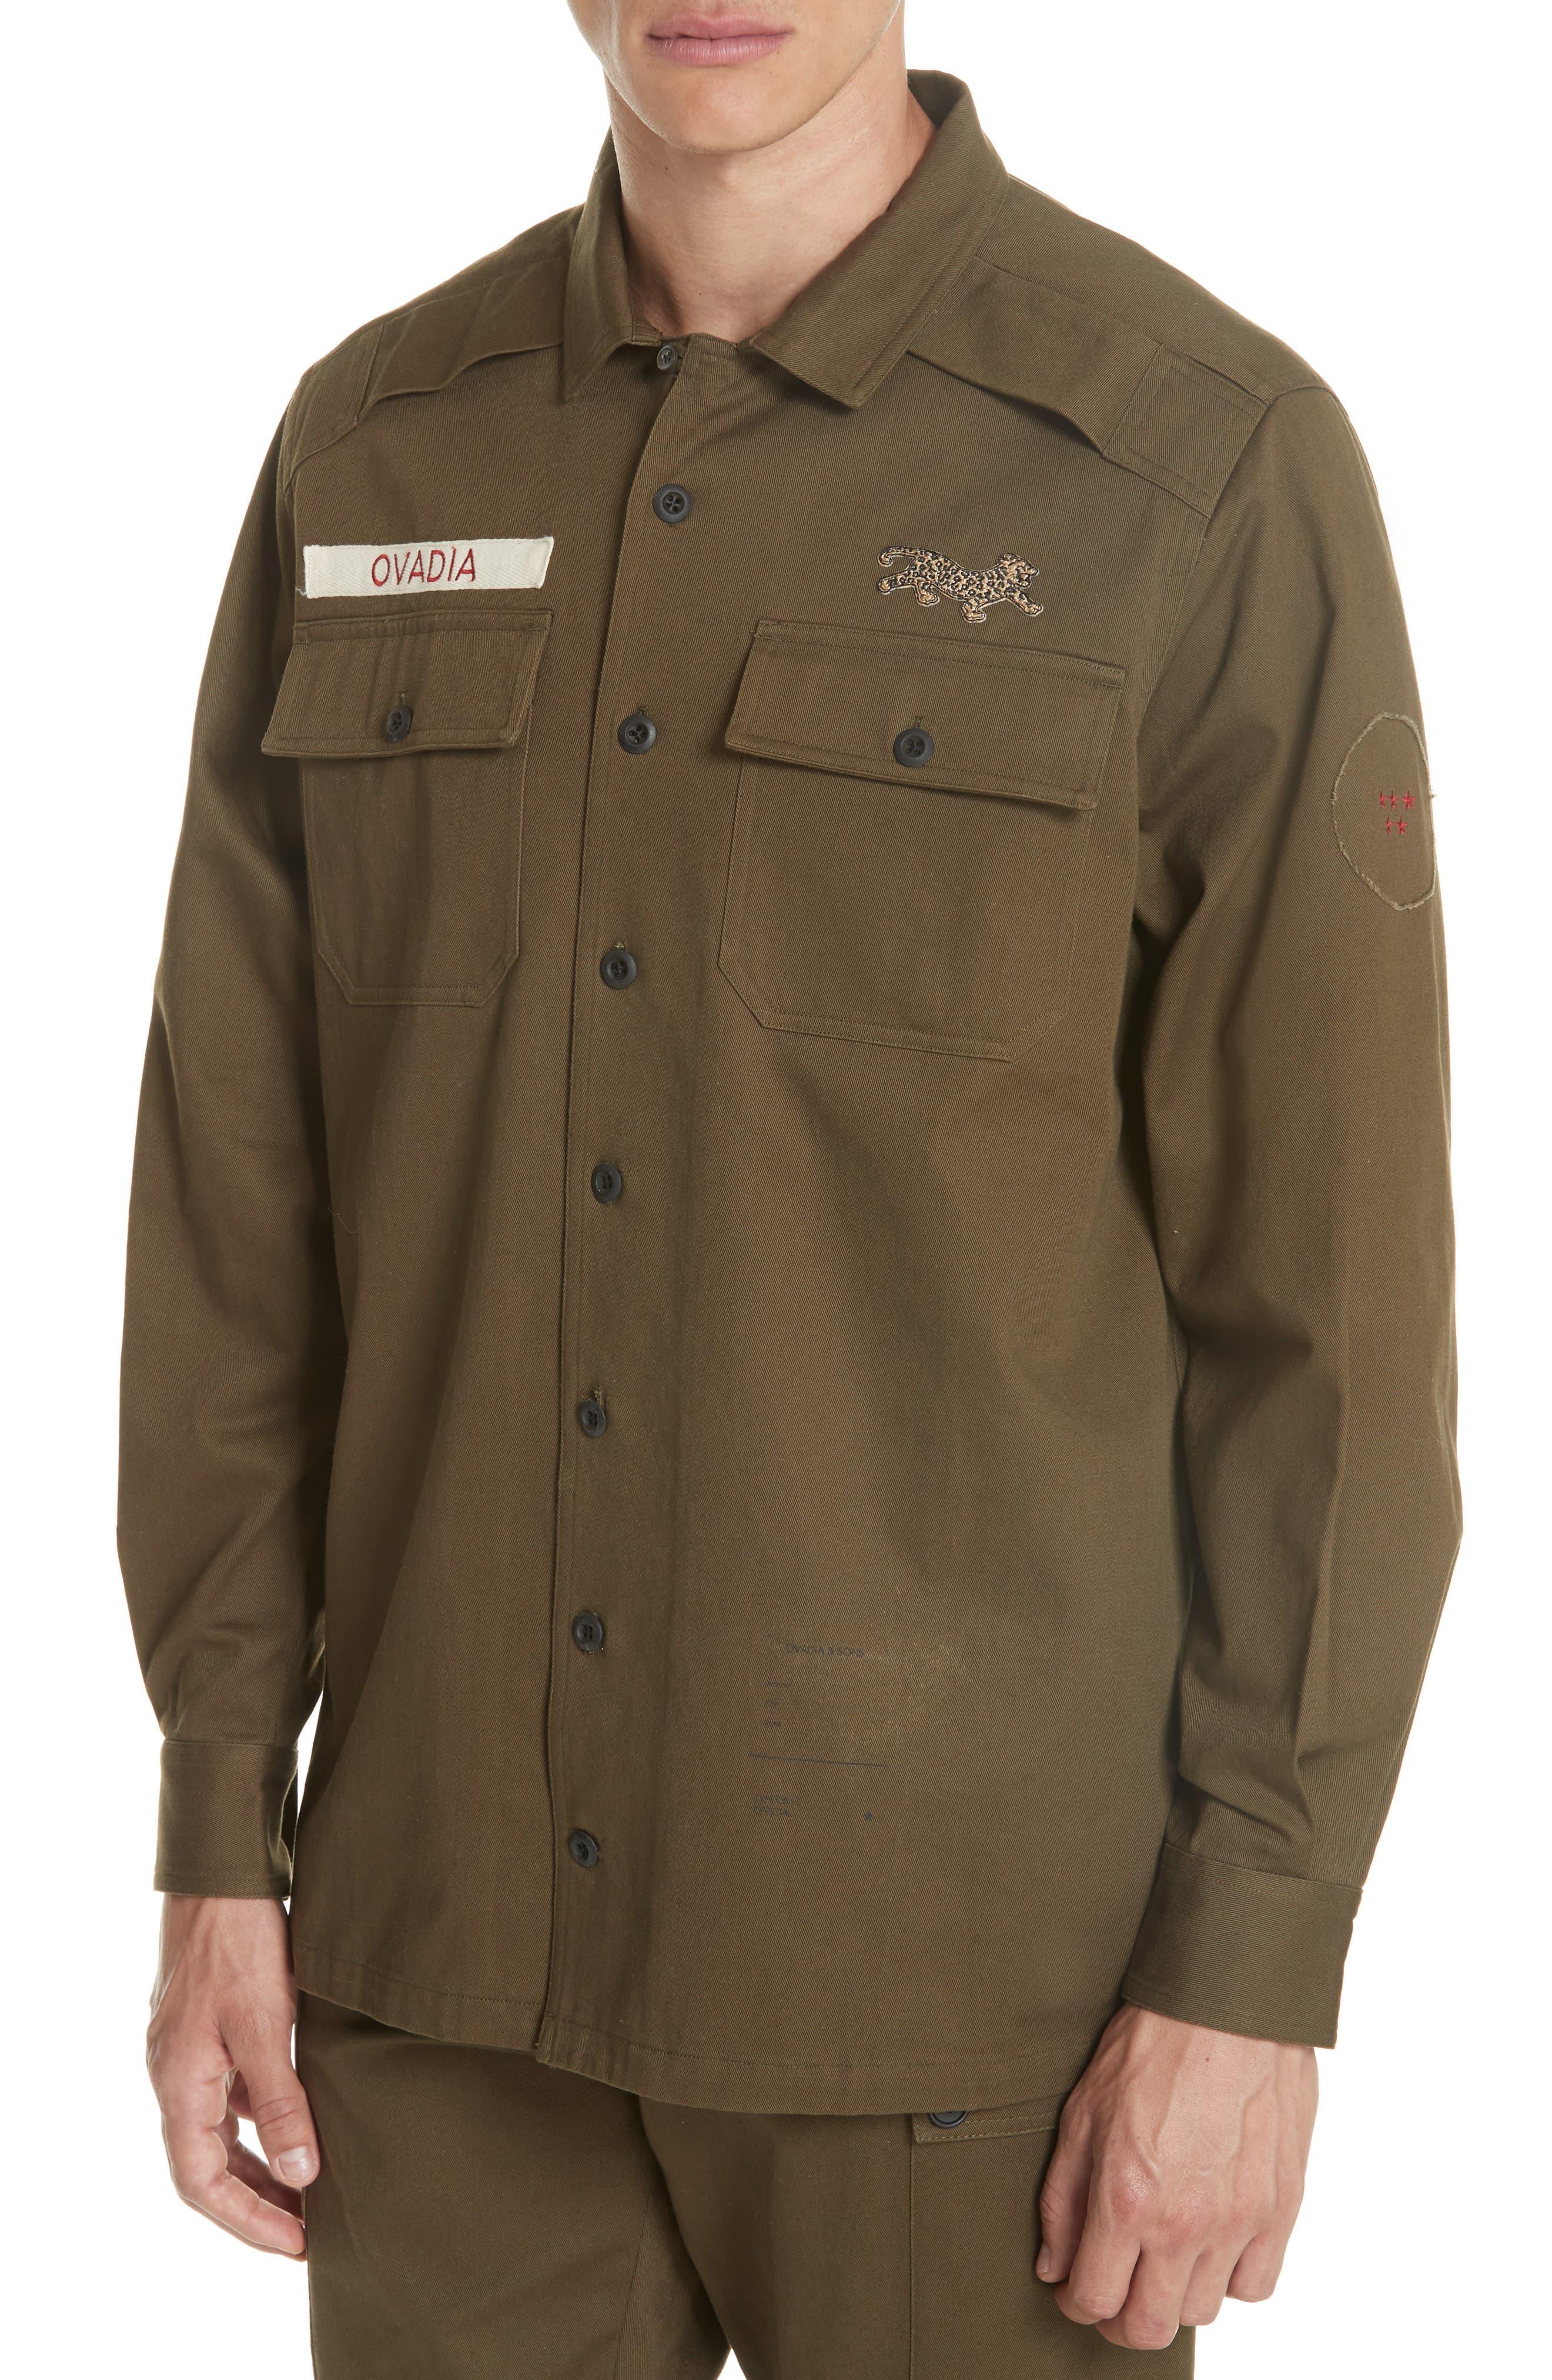 OVADIA & SONS,                             Military Woven Shirt,                             Alternate thumbnail 4, color,                             325